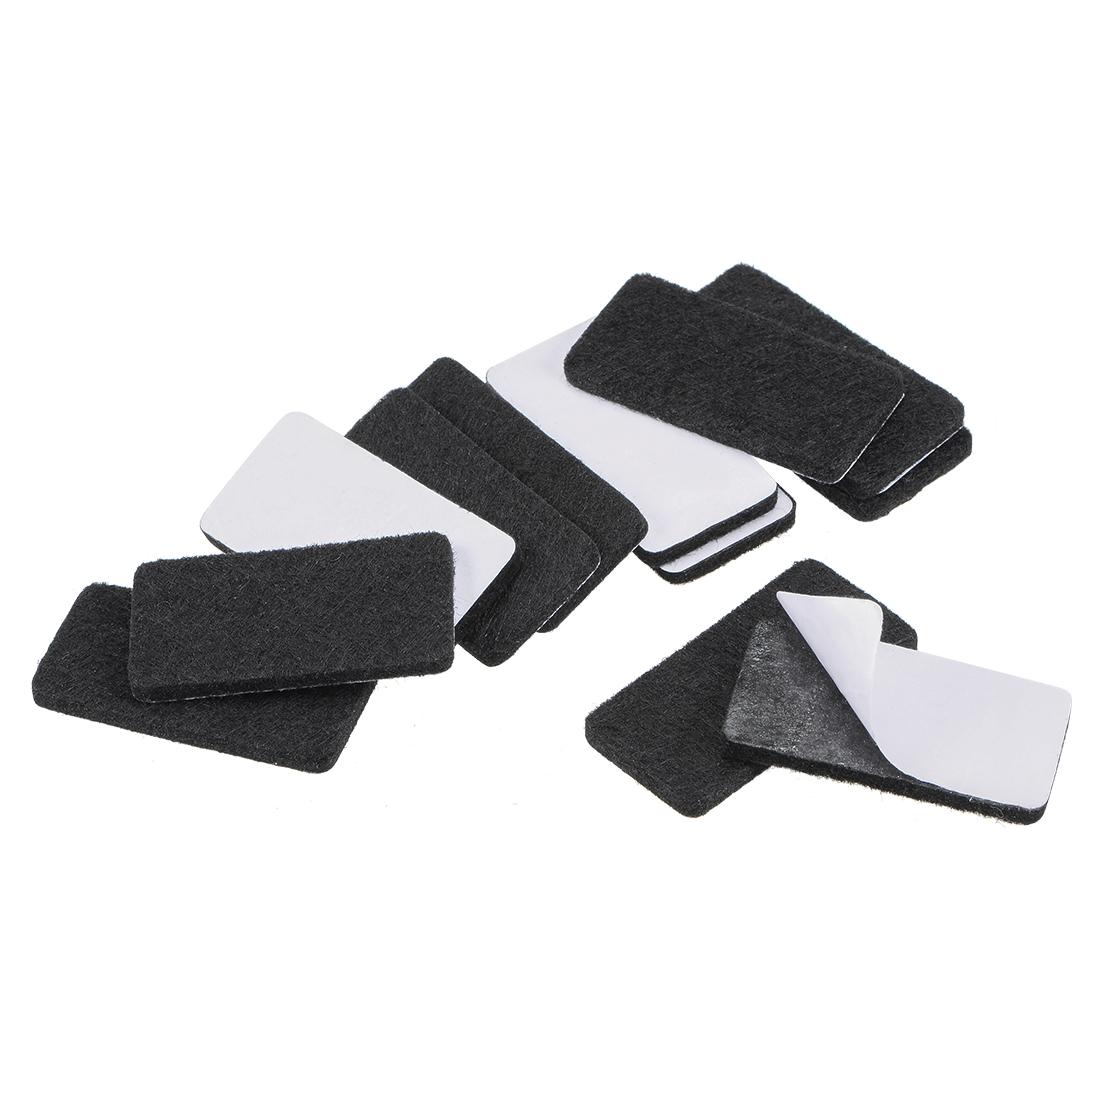 Furniture Pads 40mm x 20mm Adhesive Felt Pads 3mm Thick Black 16Pcs